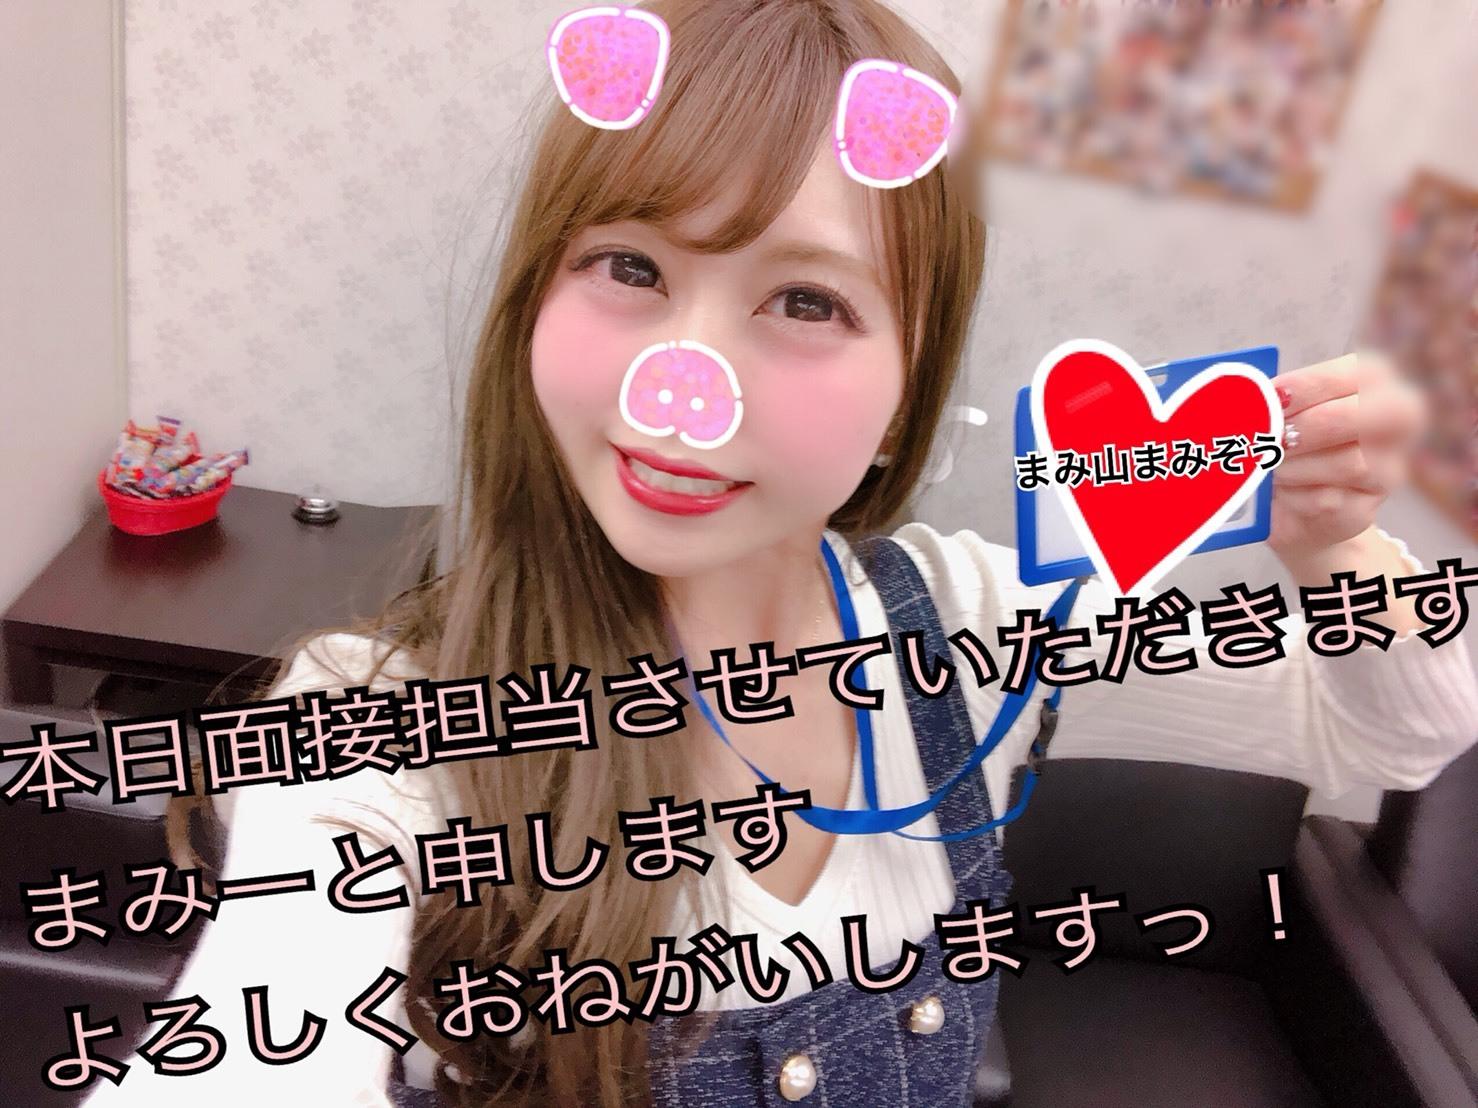 S__14966788.jpg